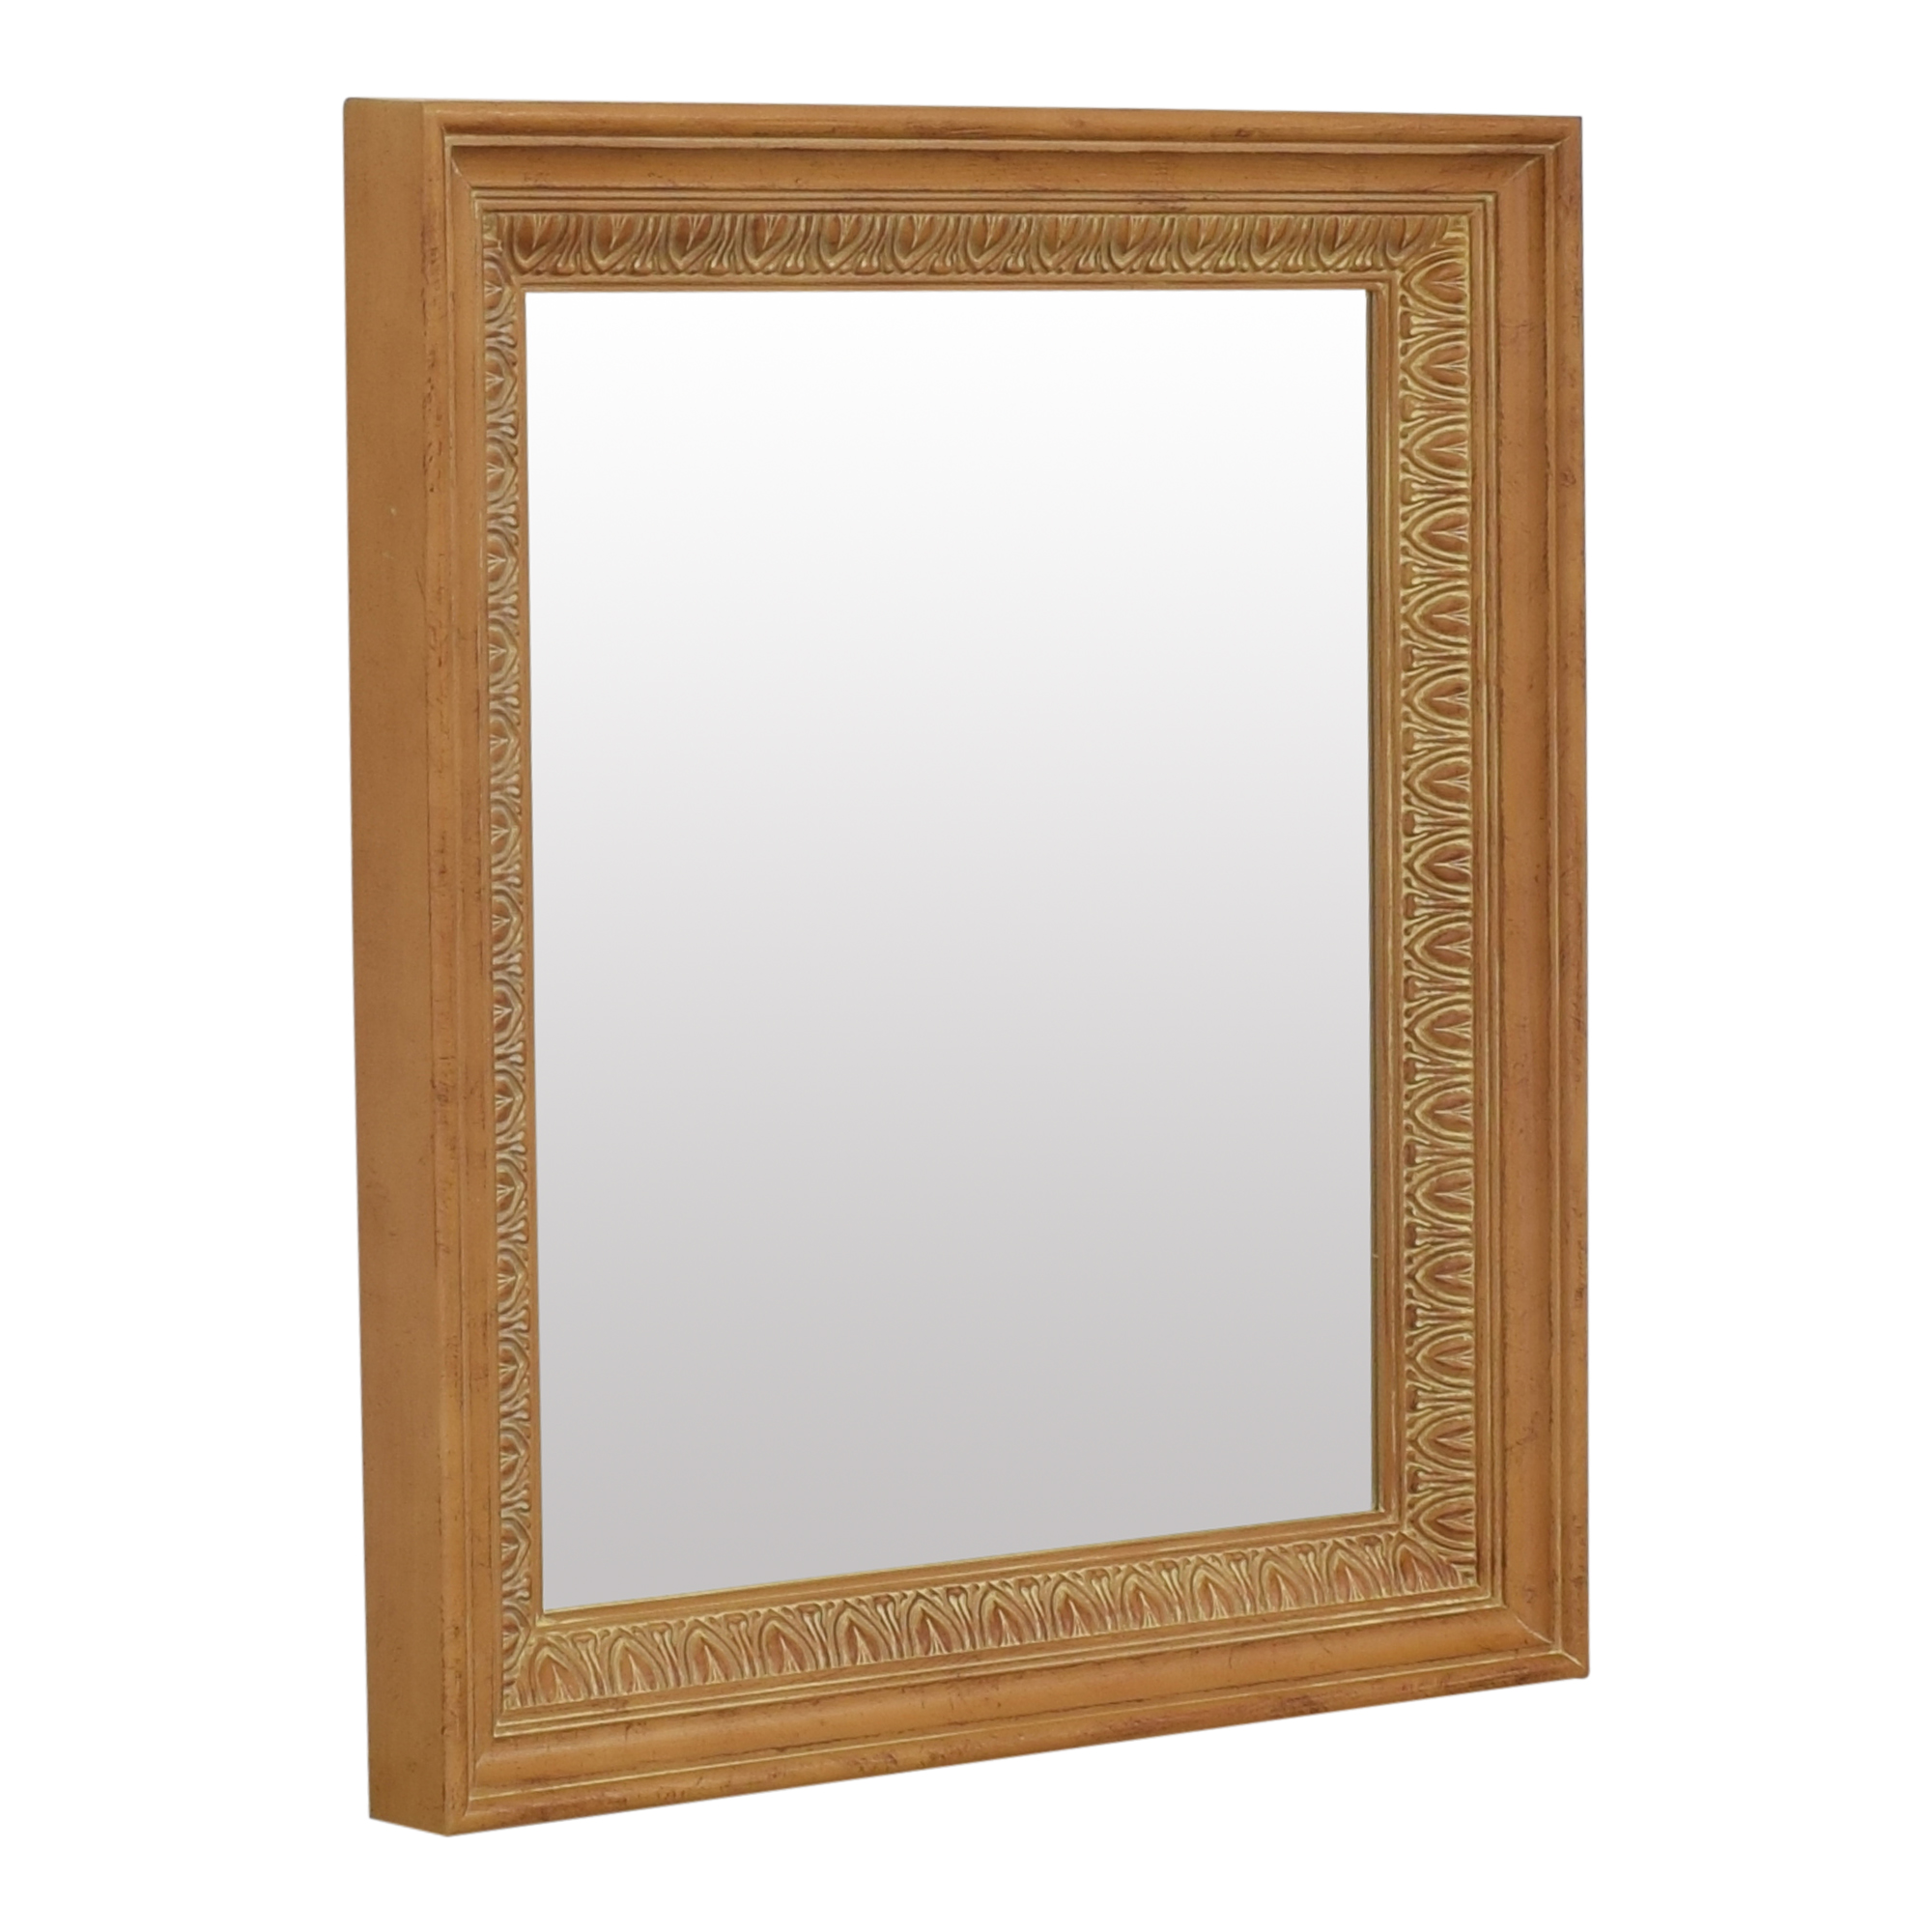 Thomasville Thomasville Santiago Collection Mirror for sale